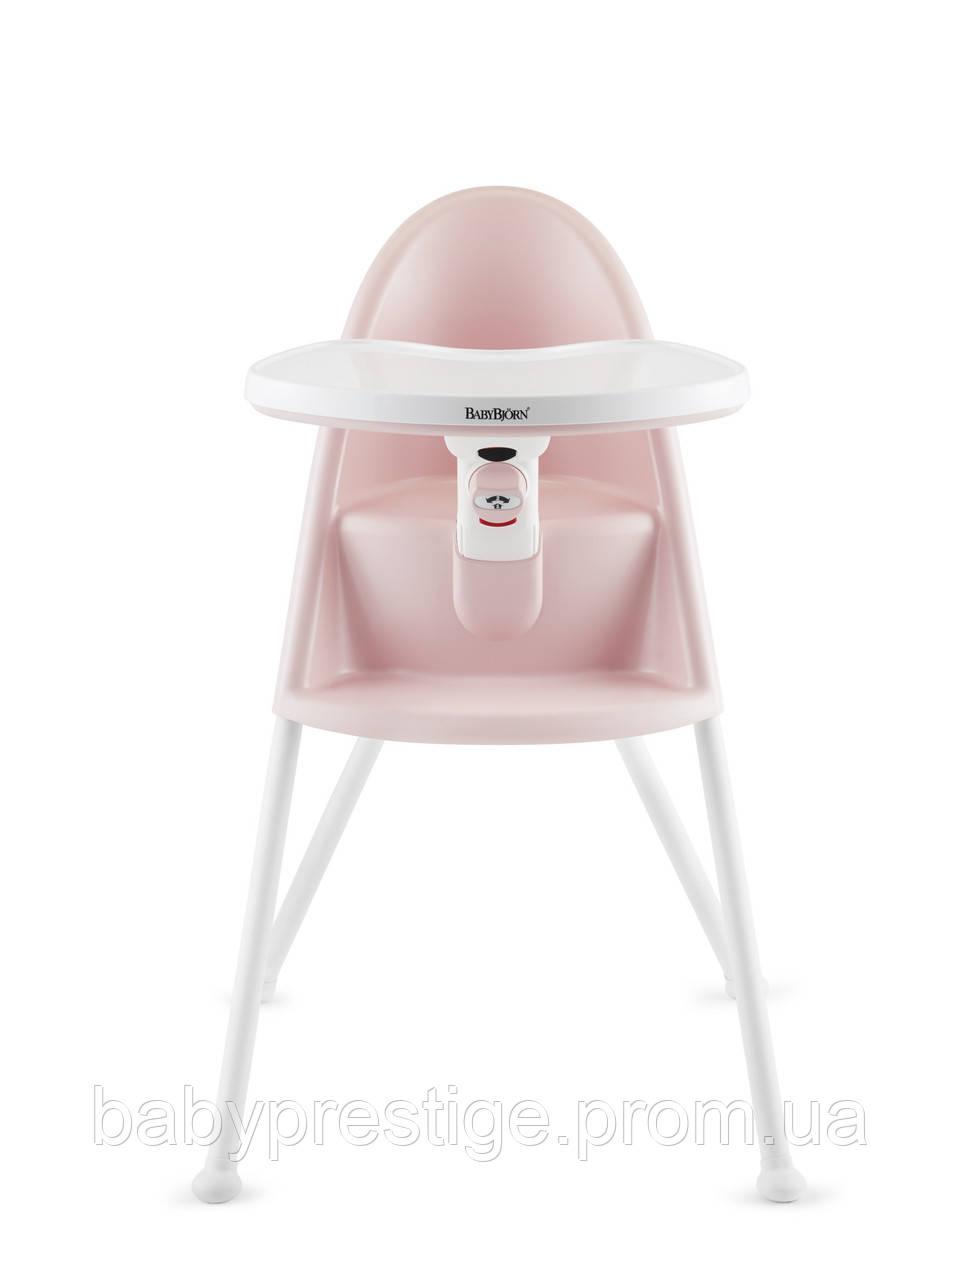 Стульчик для кормления Baby bjornHigh Chair (розовый)